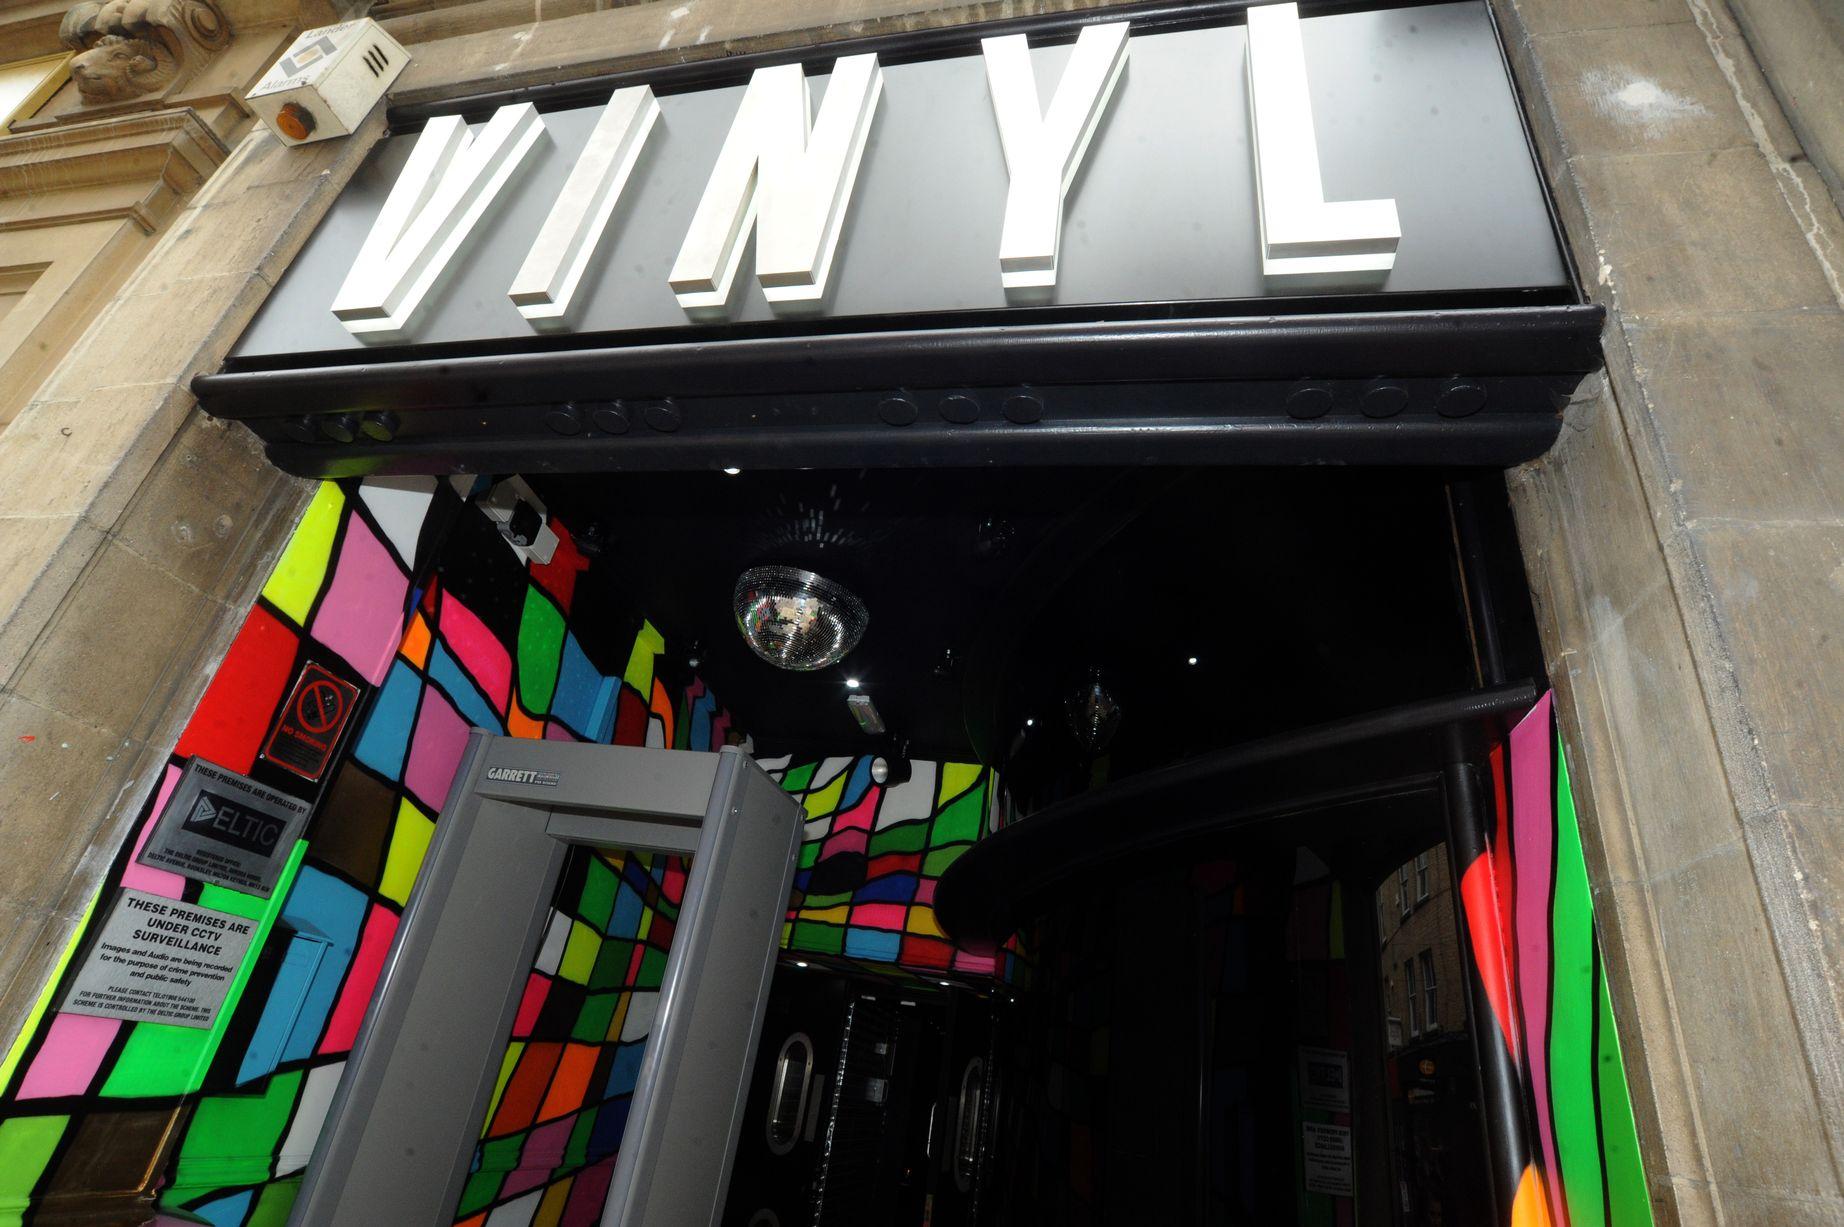 The new Vinyl retro-themed nightclub in central Cambridge